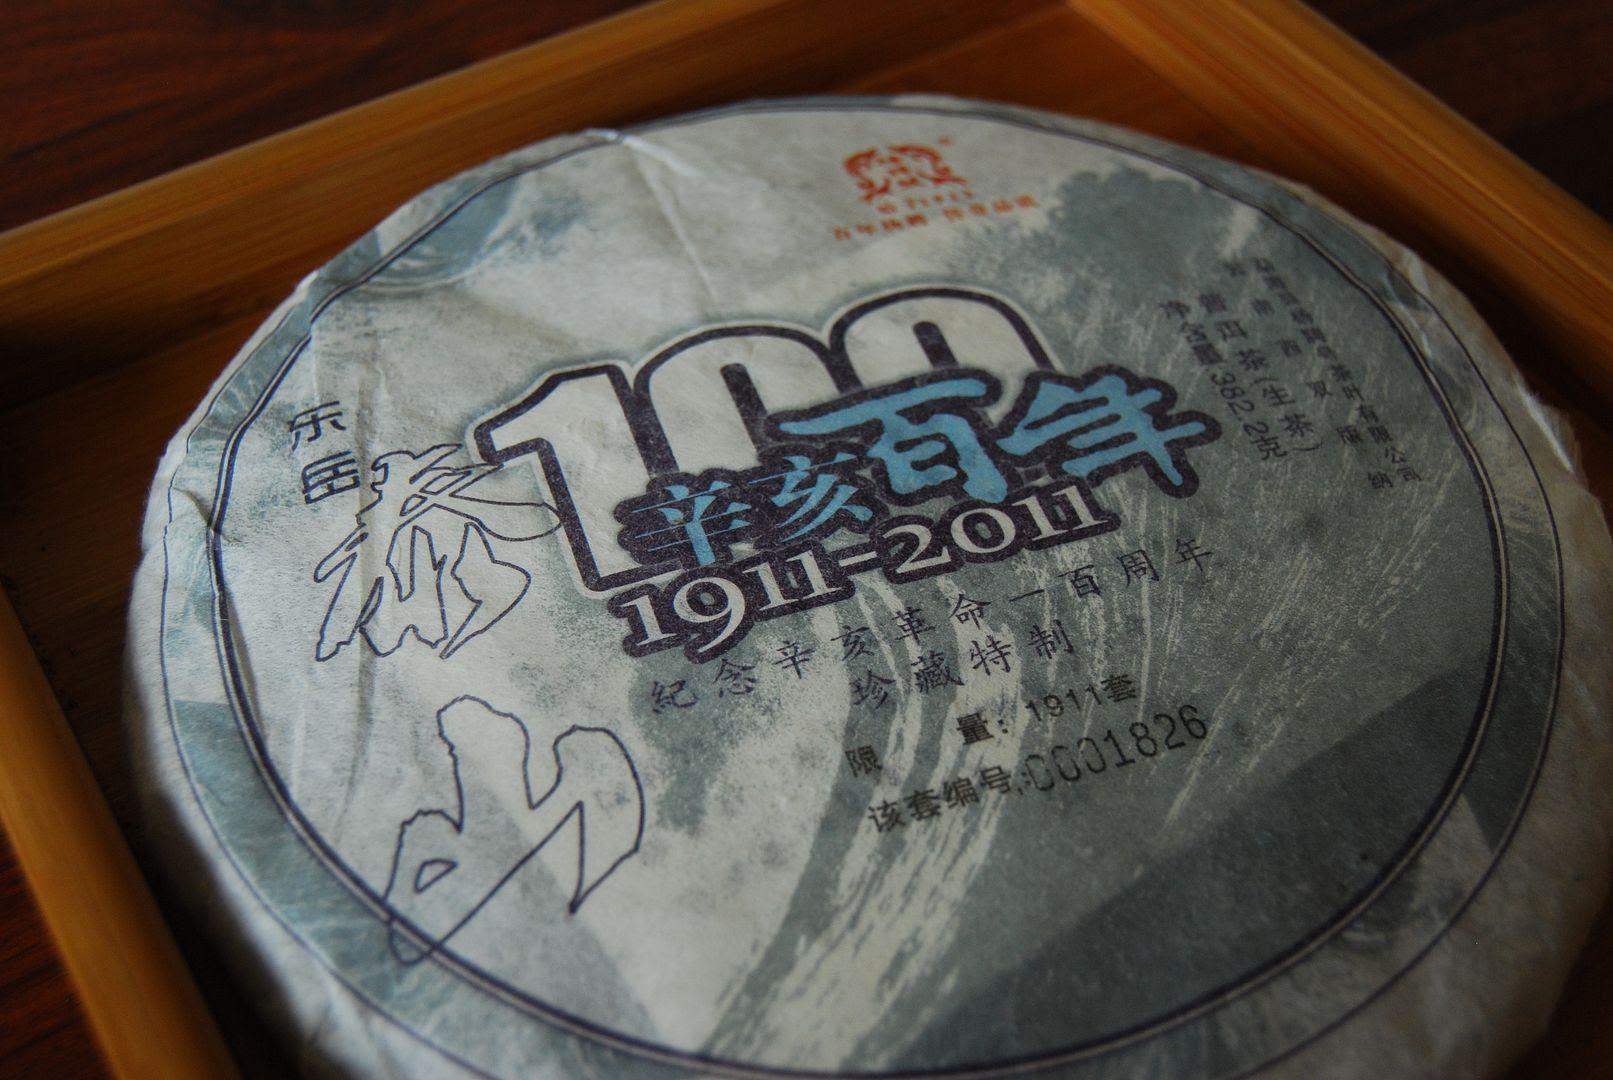 2011 Yangpinhao Xinhai Bainian